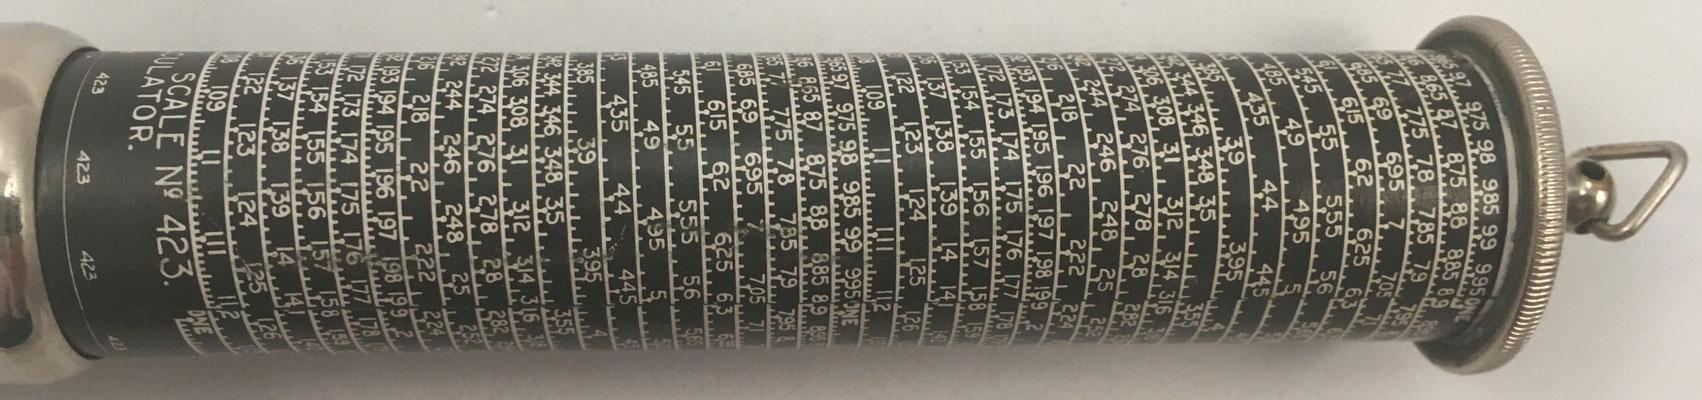 Escala nº 423, Otins King's Pocket Calculator